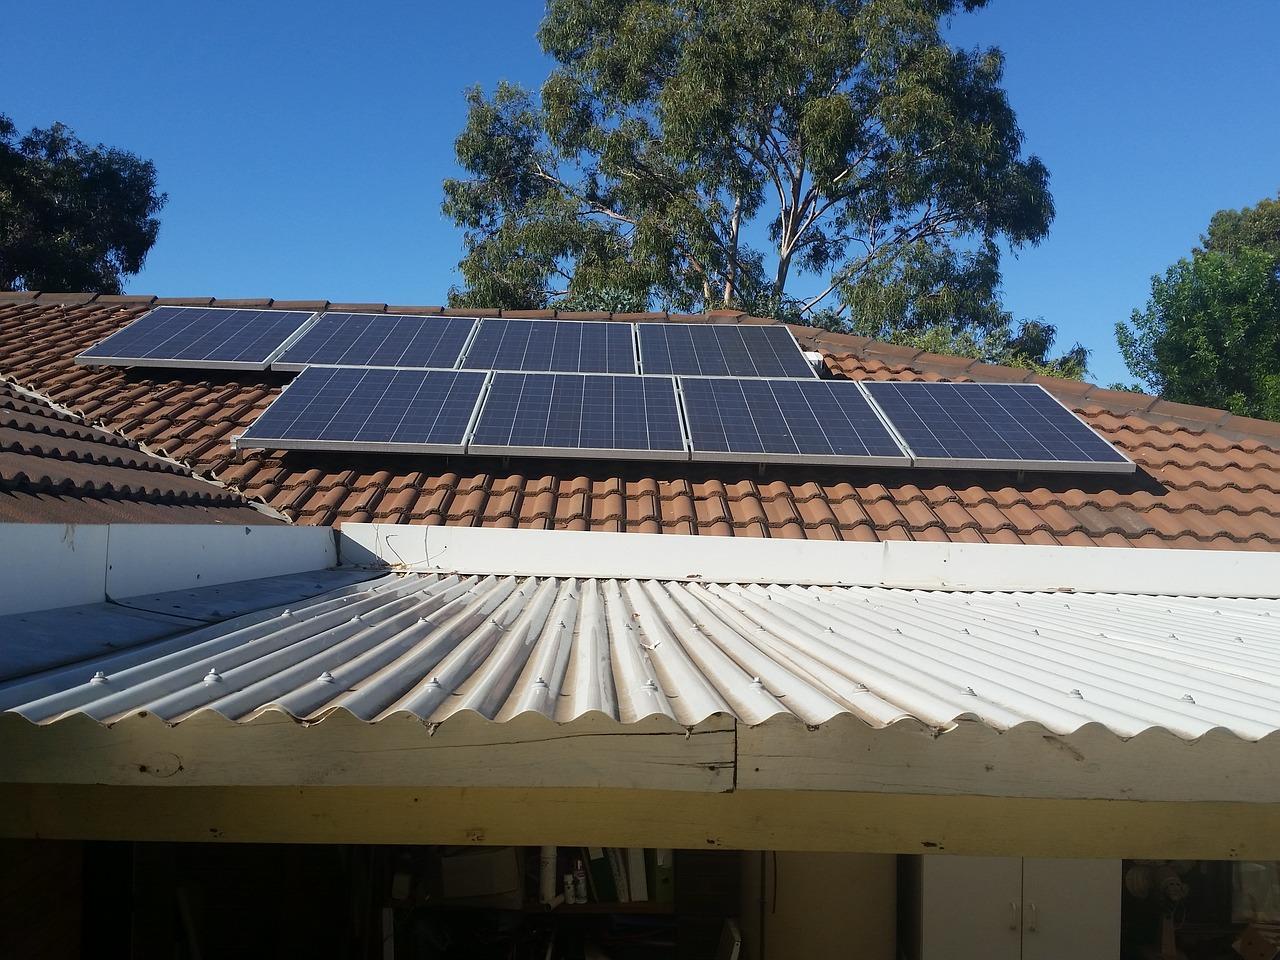 solar-panels-2685357_1280-1525884482826.jpg